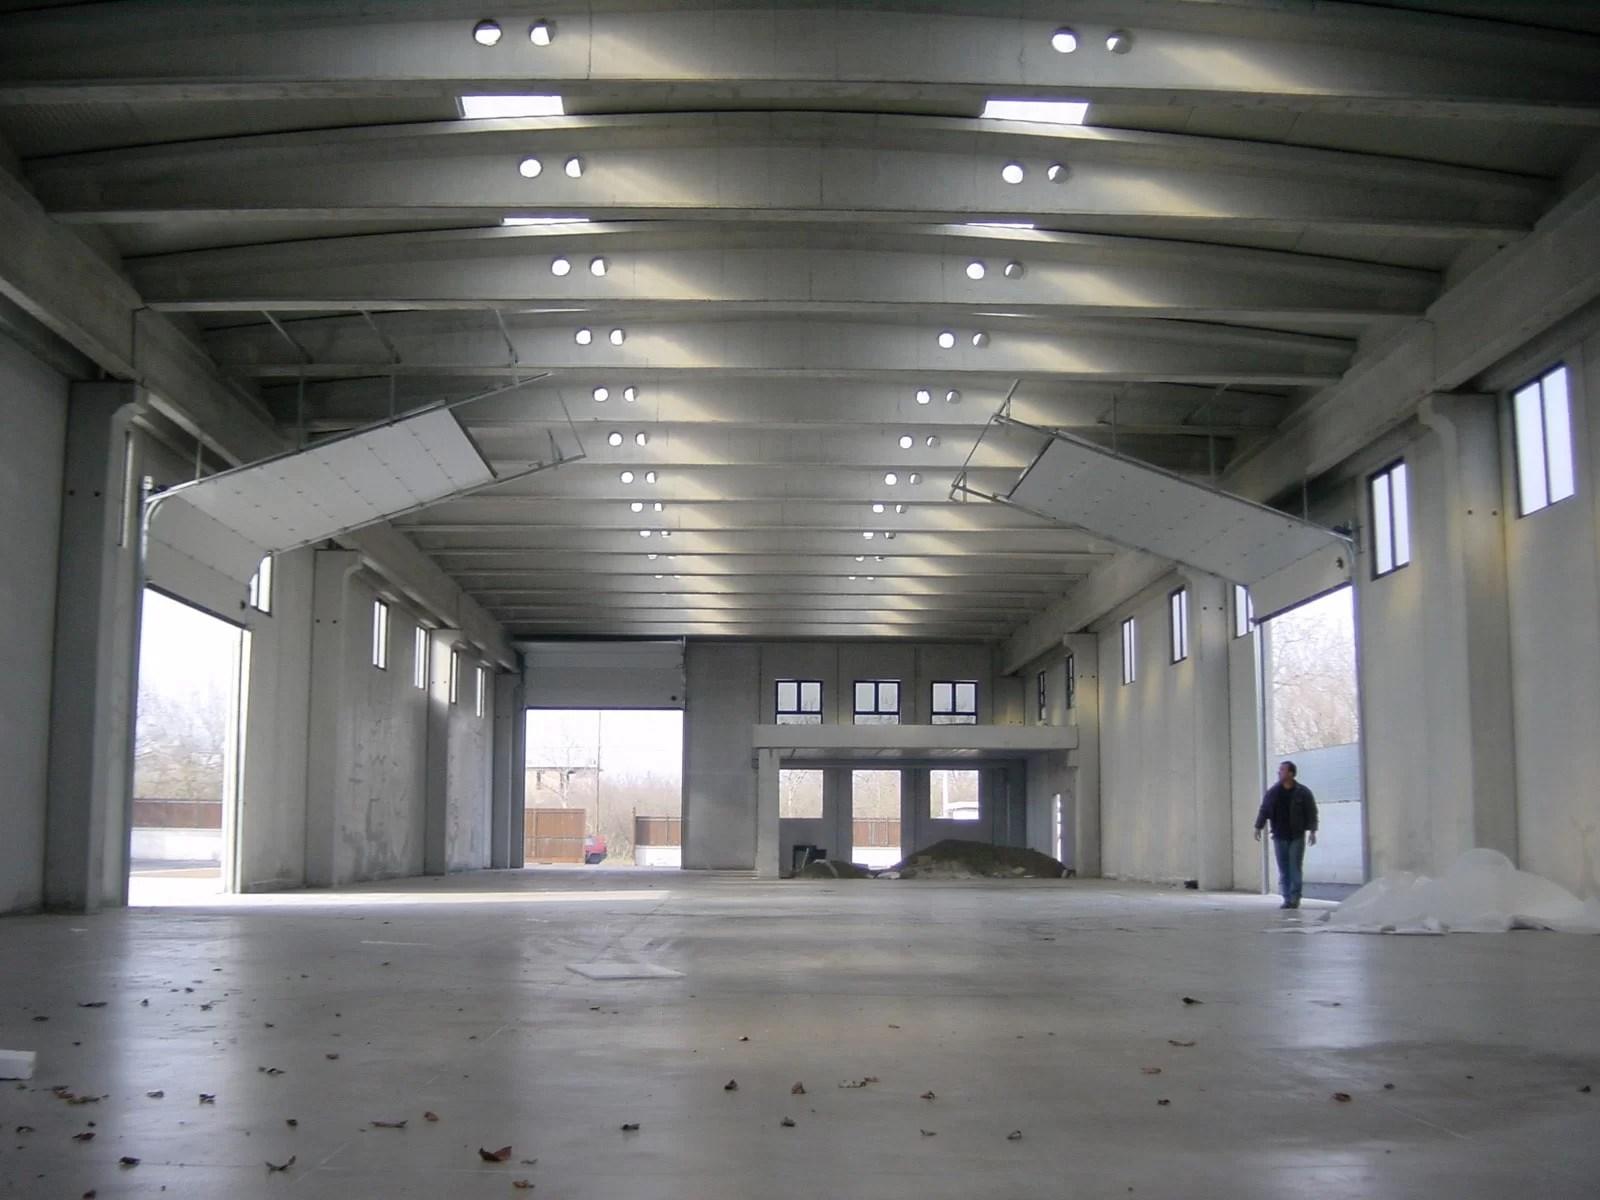 Portone sezionale industriale DOCK - Stucco bianco C21 vista interna